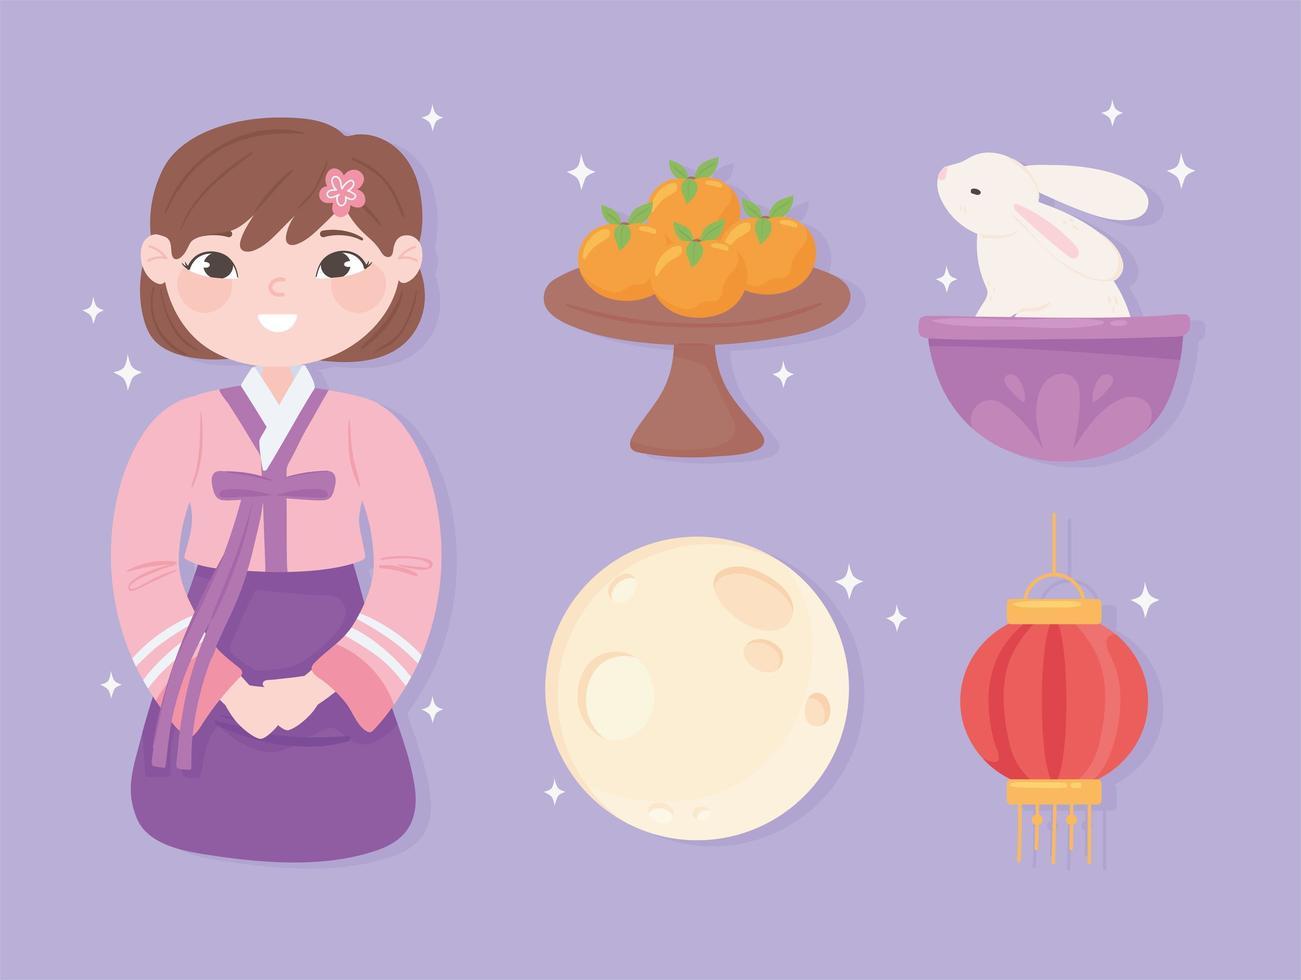 menina coreana e ícones vetor